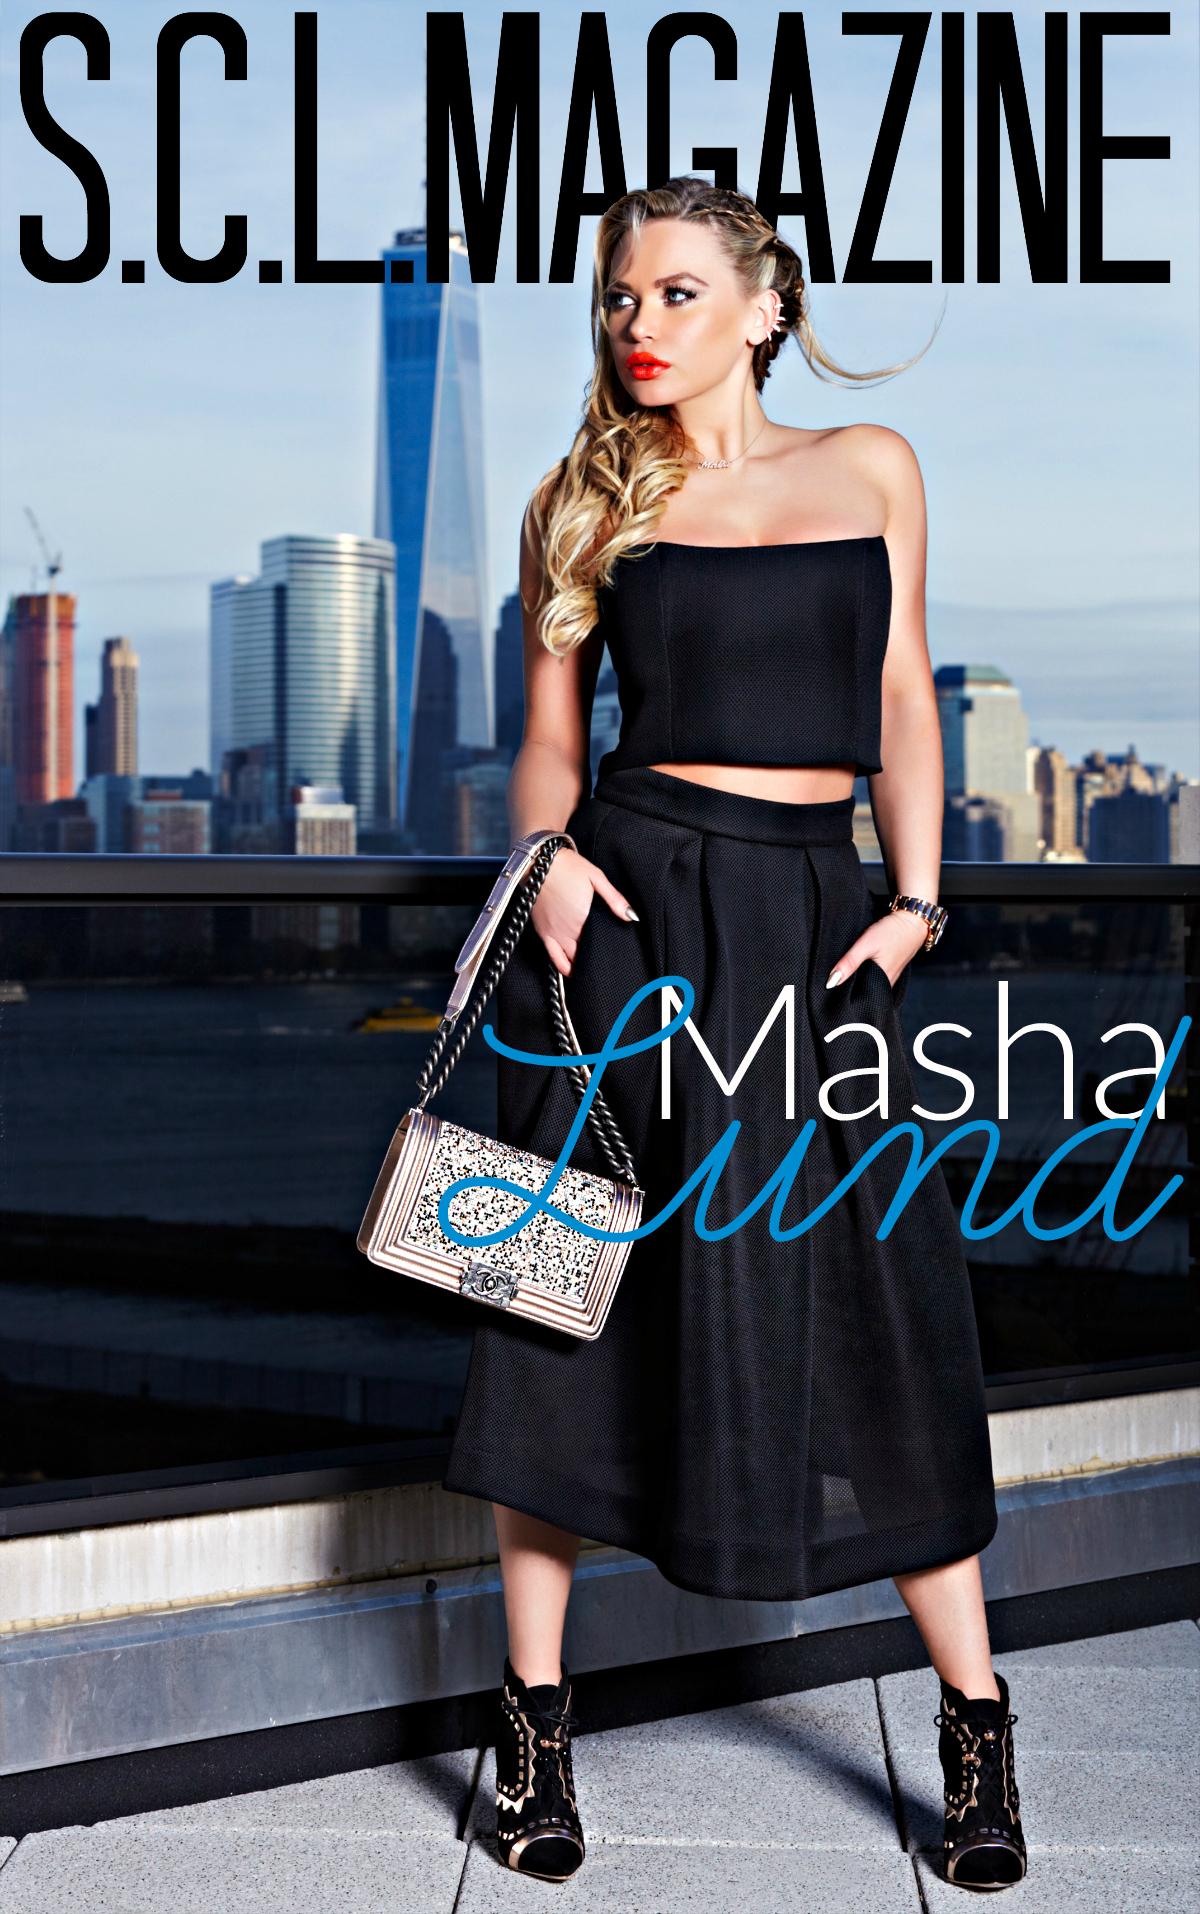 Masha_Lund_Cover1200